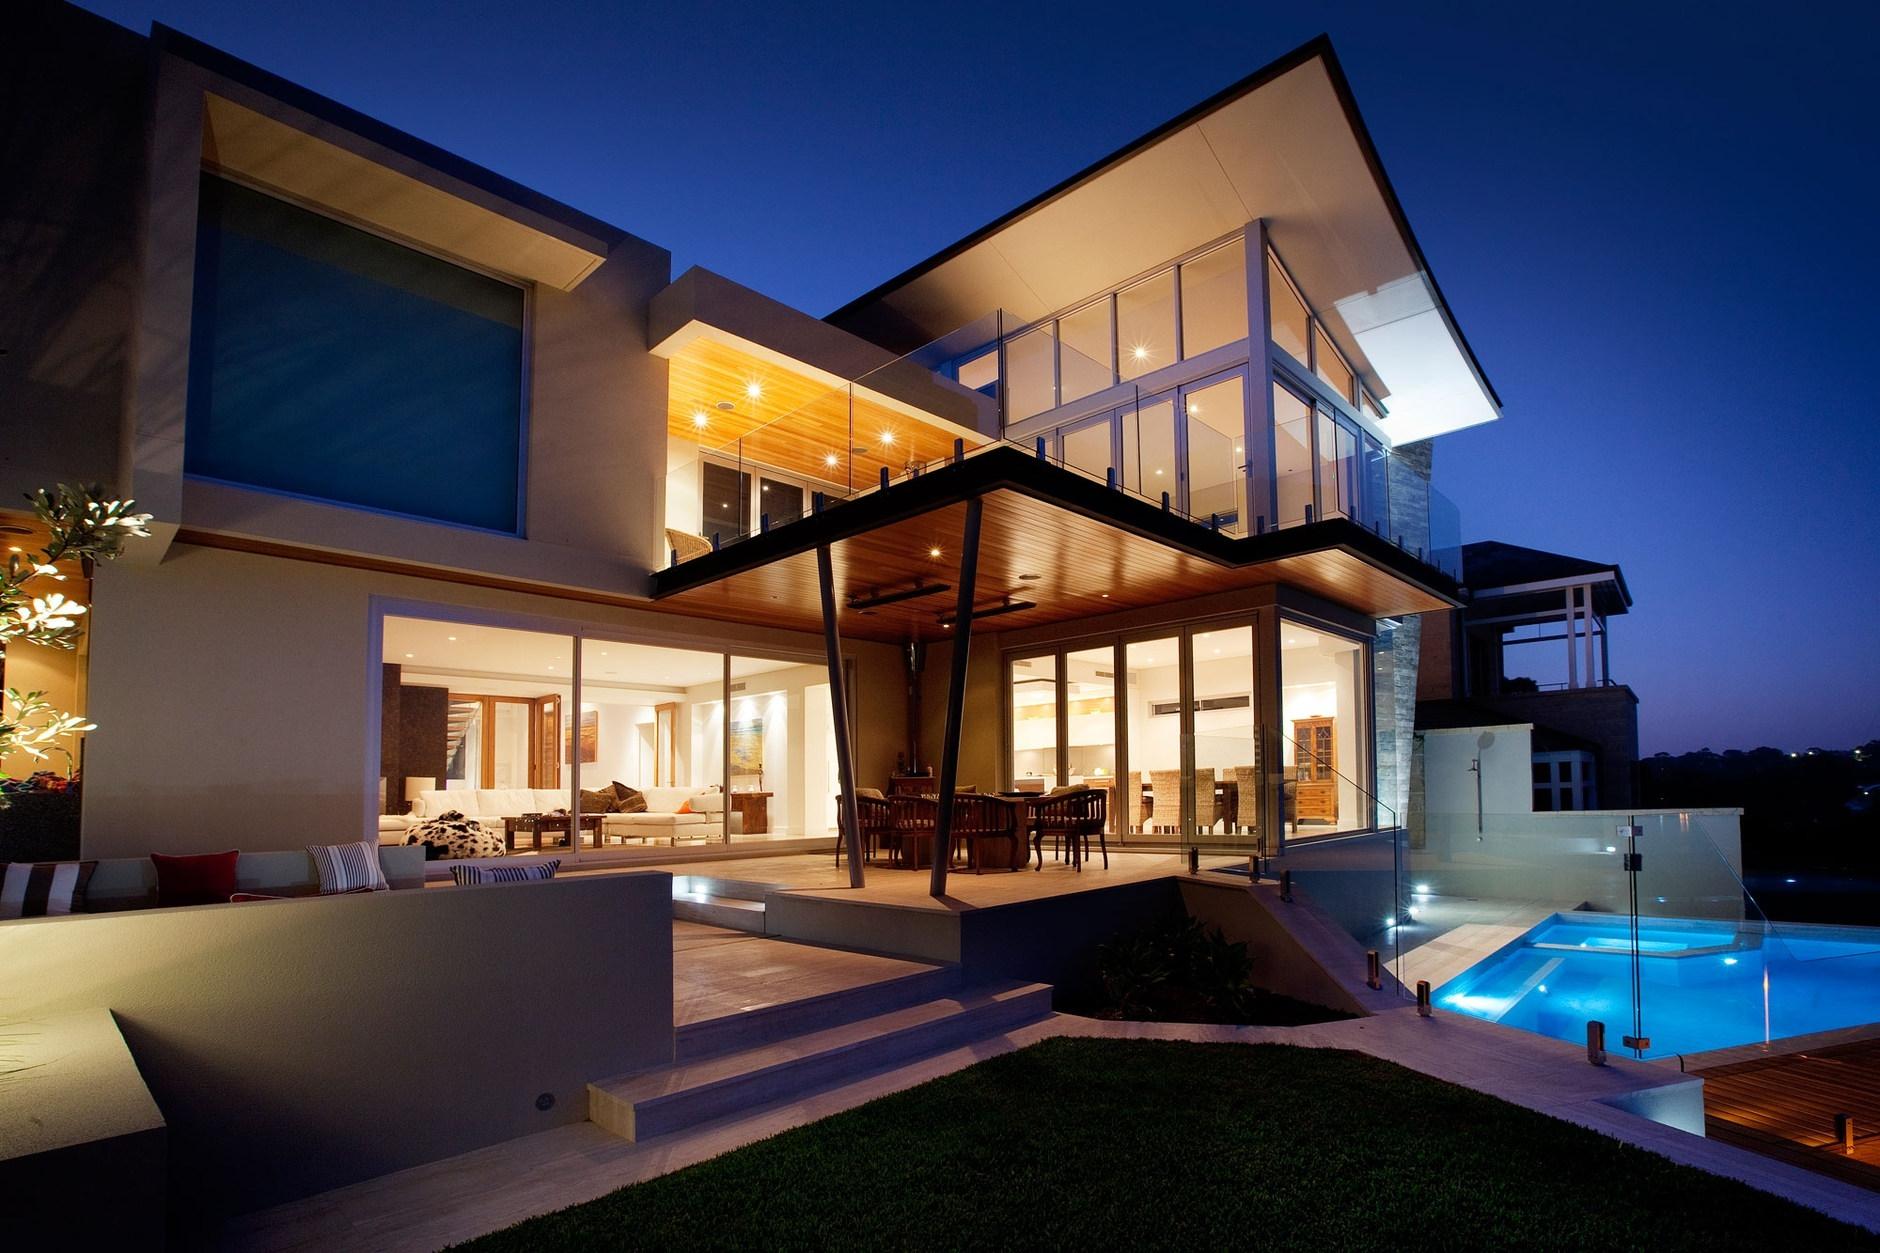 Bicton By Ritz Exterior Design Karmatrendz